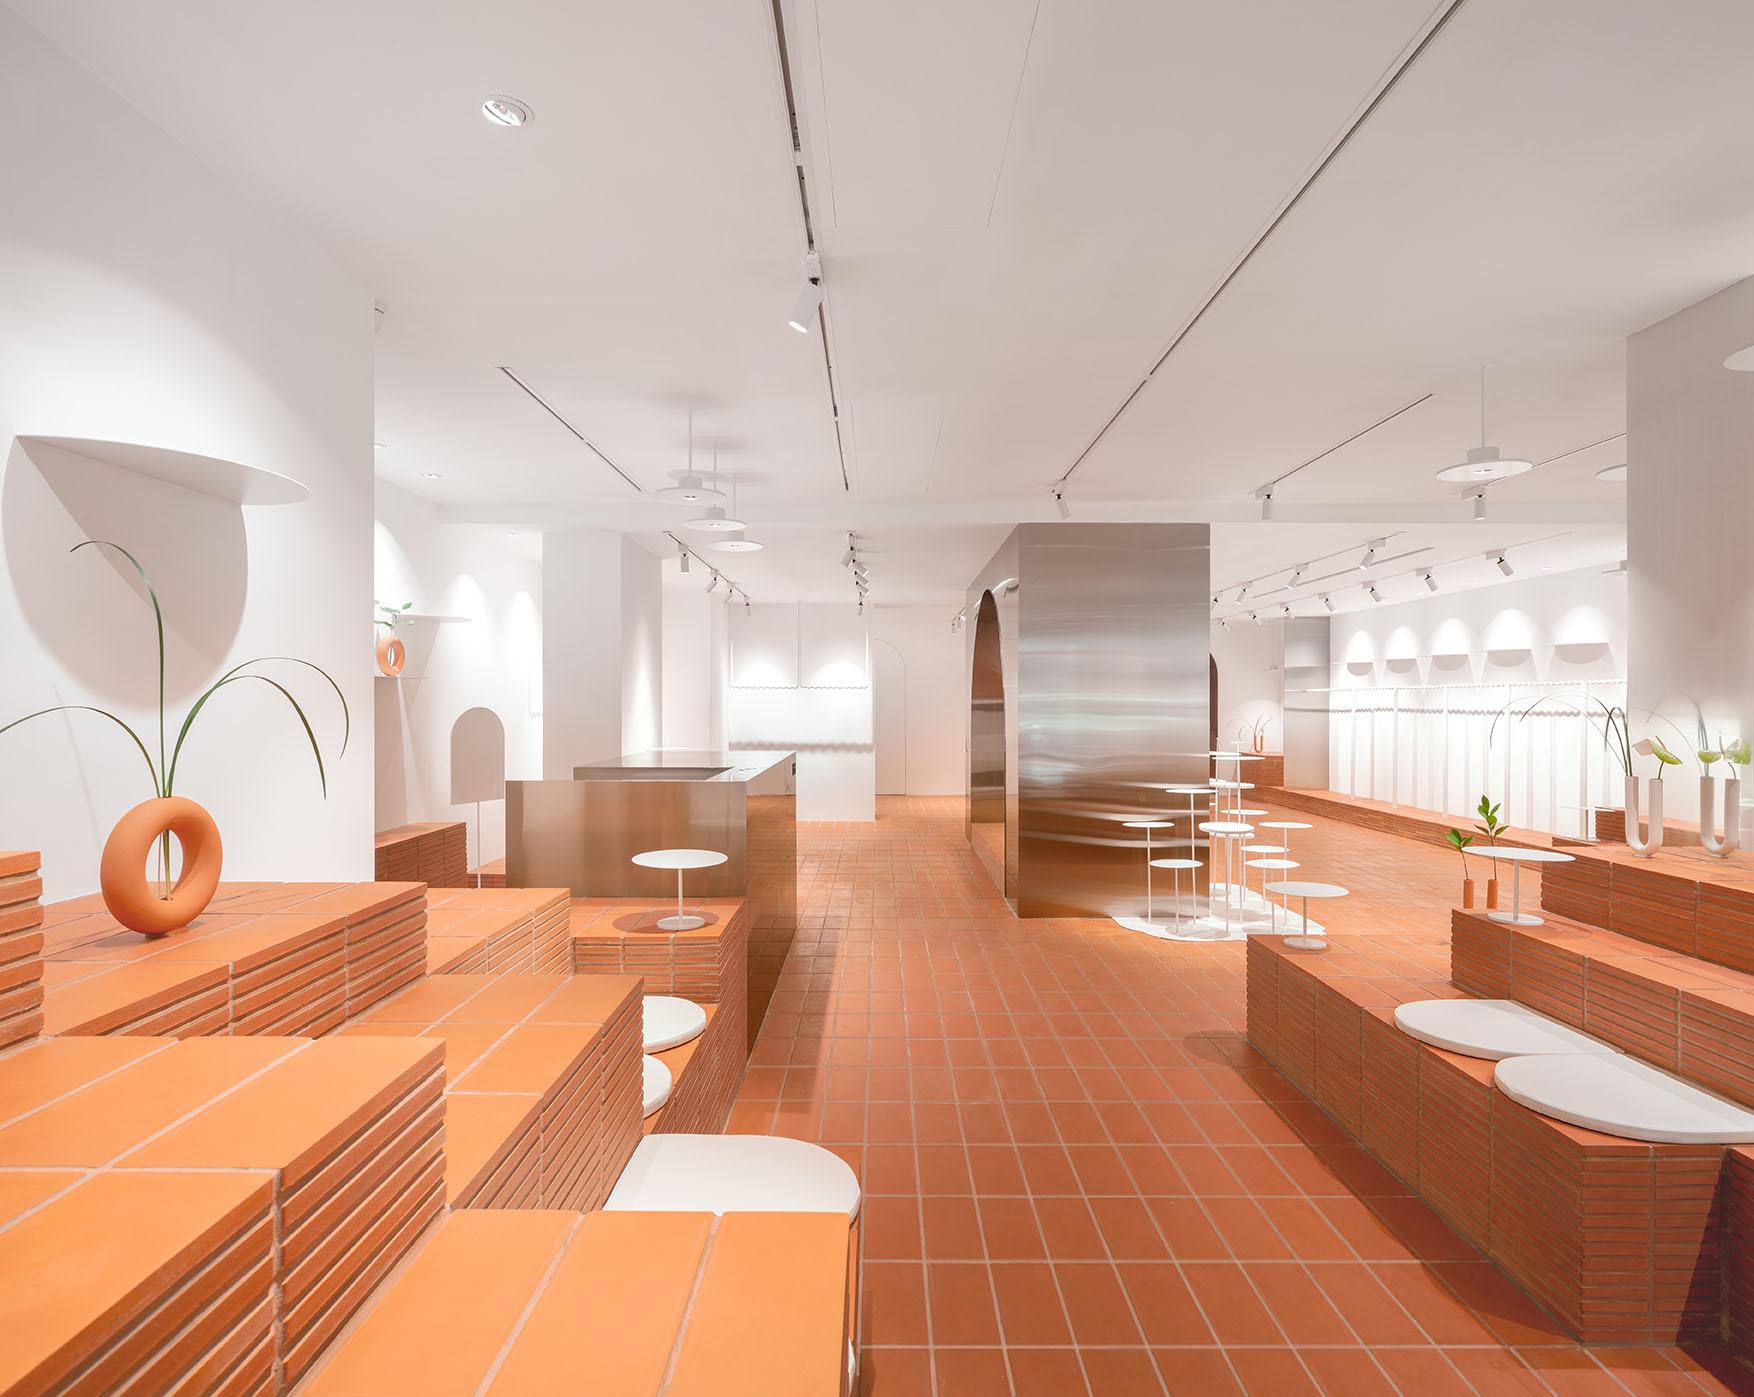 Clap-Studio-interior-design-retail-HER-Hilary-Tsui-hong-kong-fahion-store